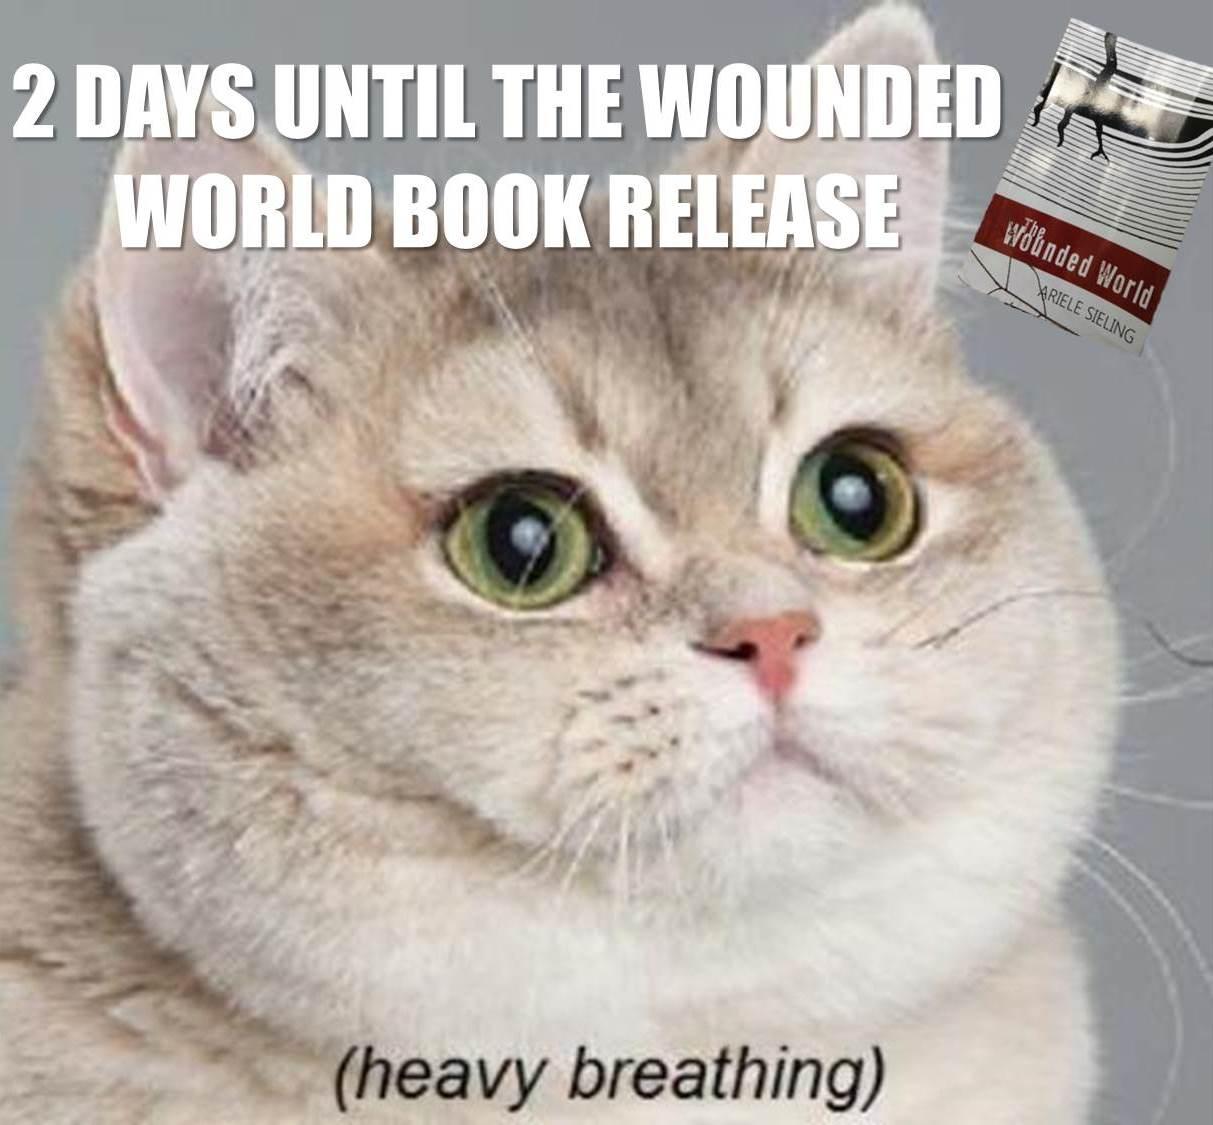 Cat-WoundedWorld.jpg